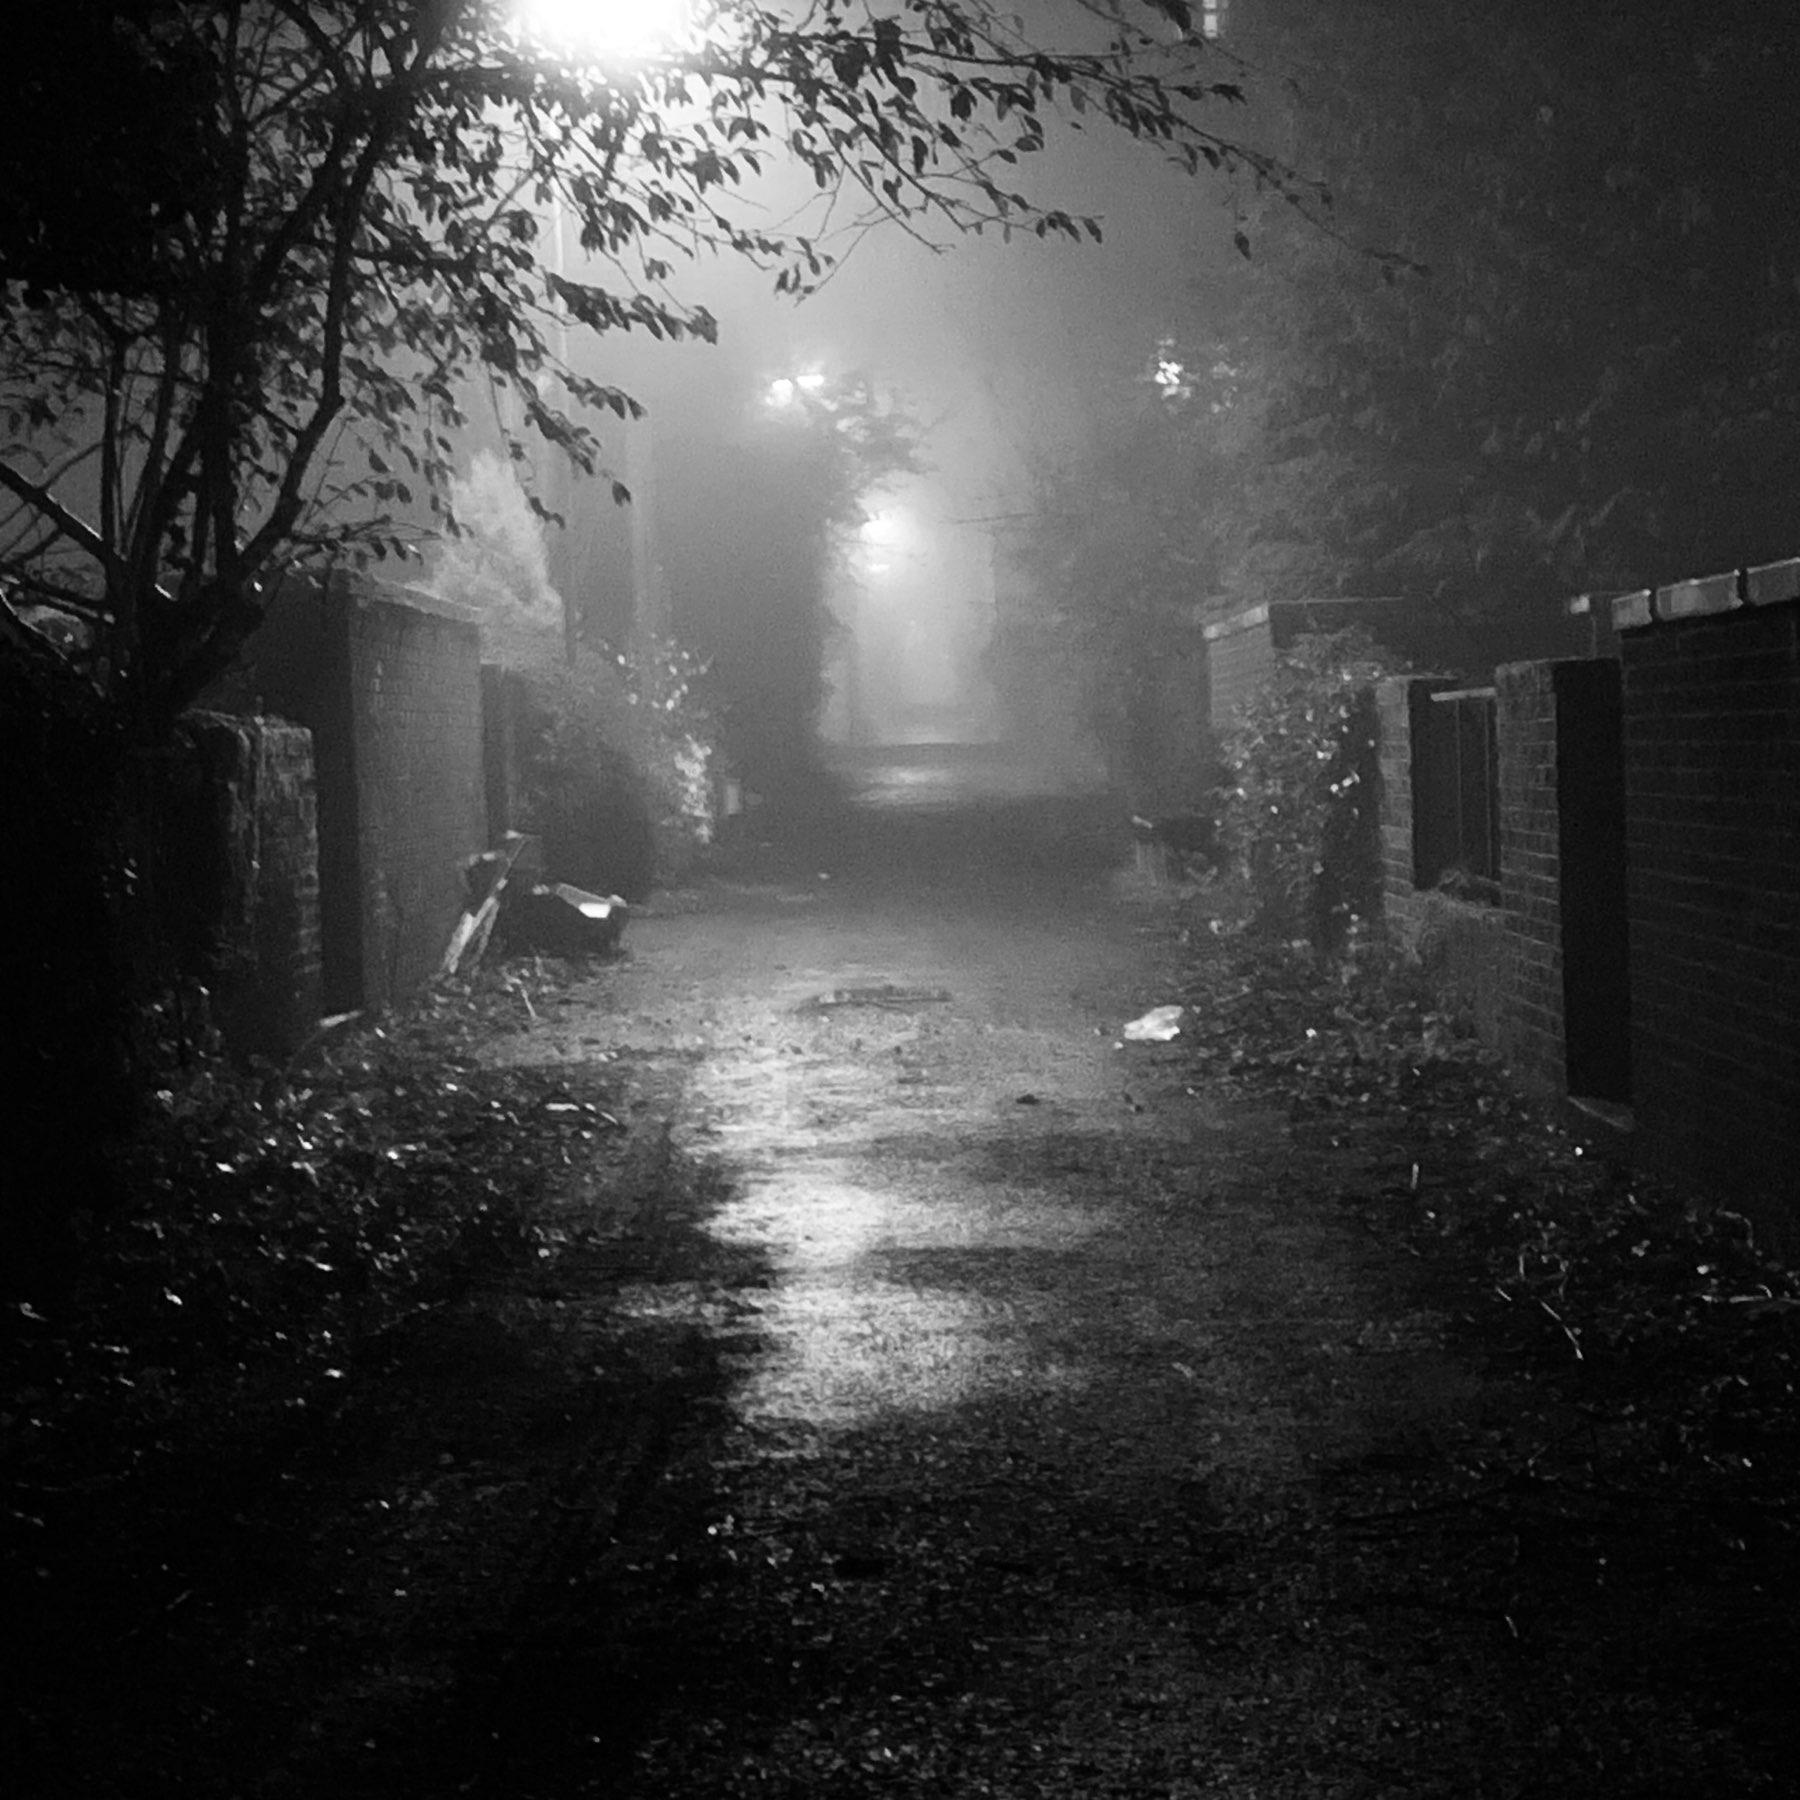 misty in bin lane at night. Broomhill Glasgow.